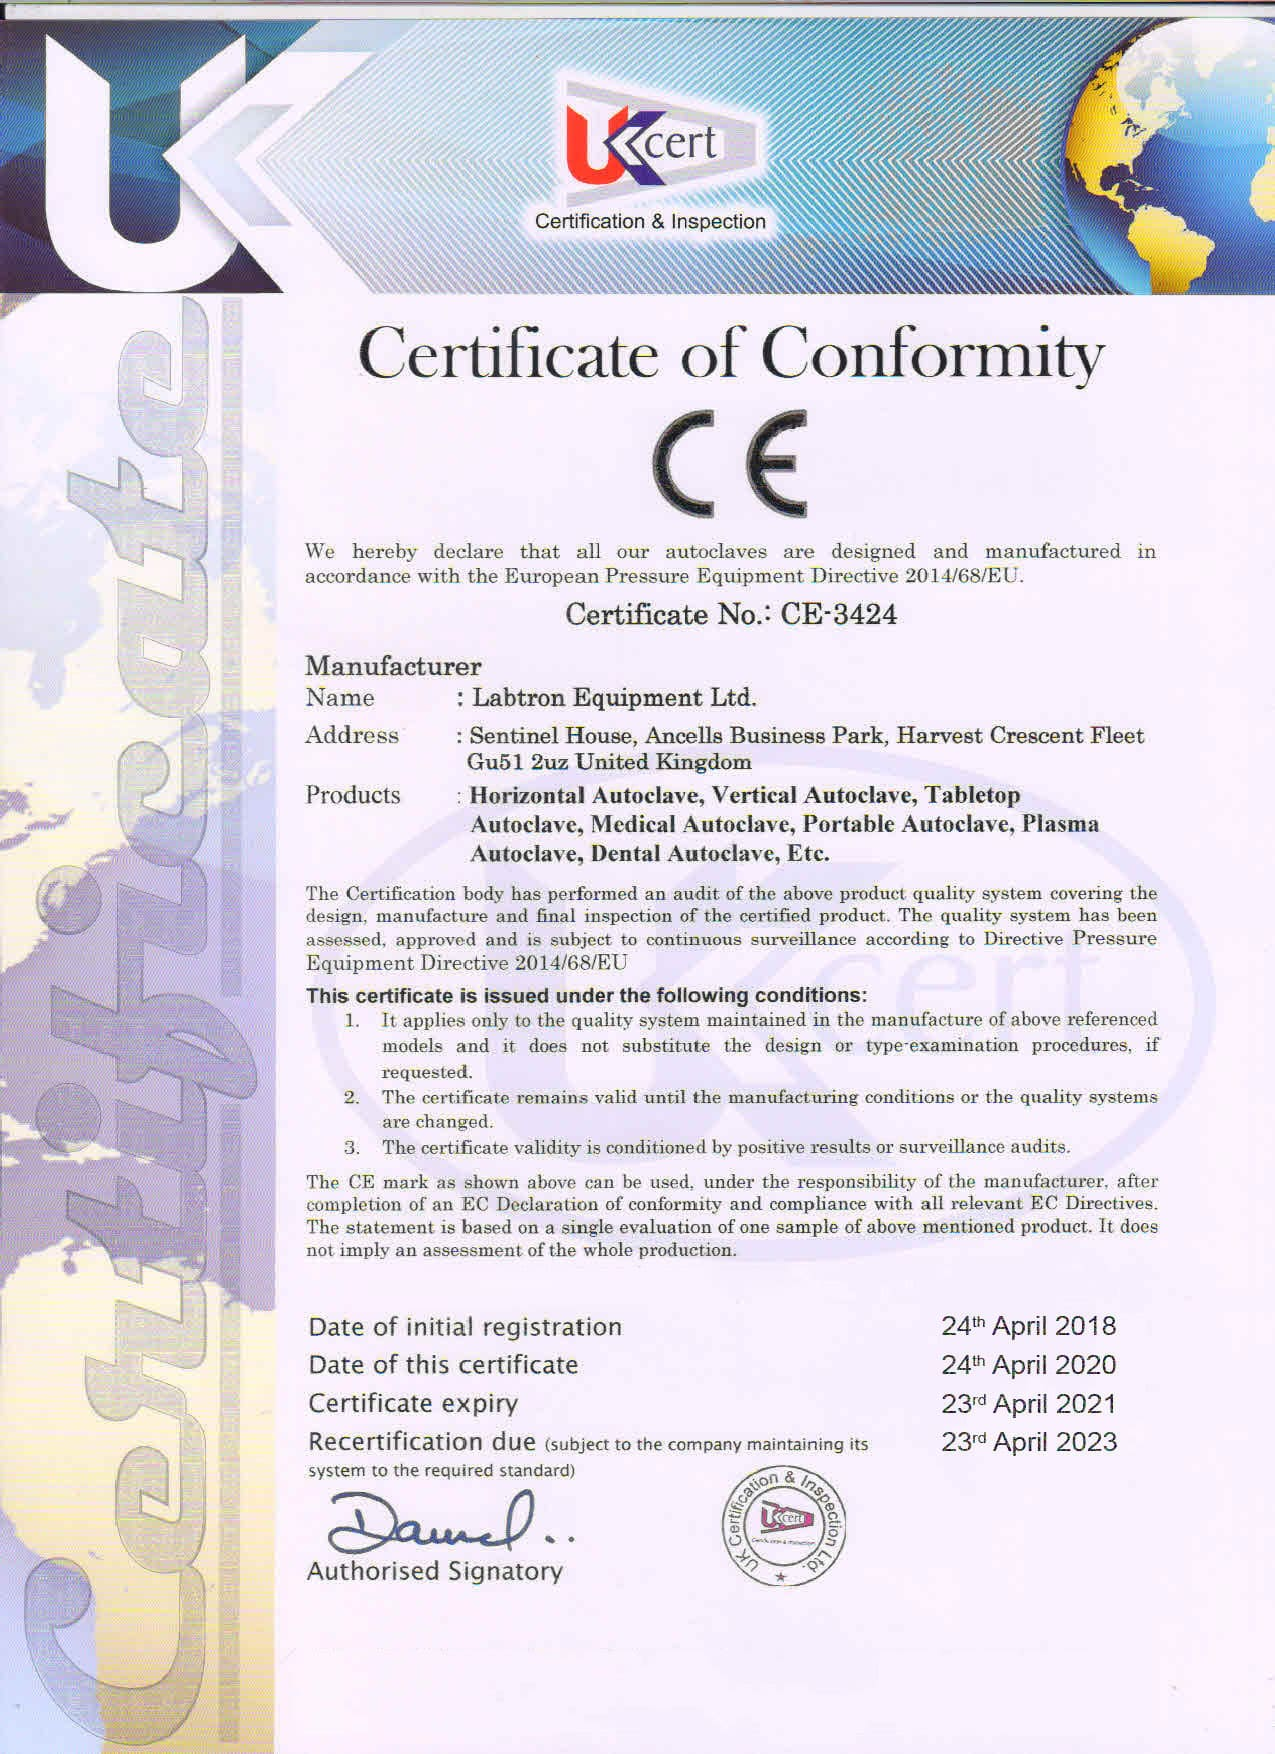 Labtron Equipment Ltd. Certificate of Conformity : Labtron Certification